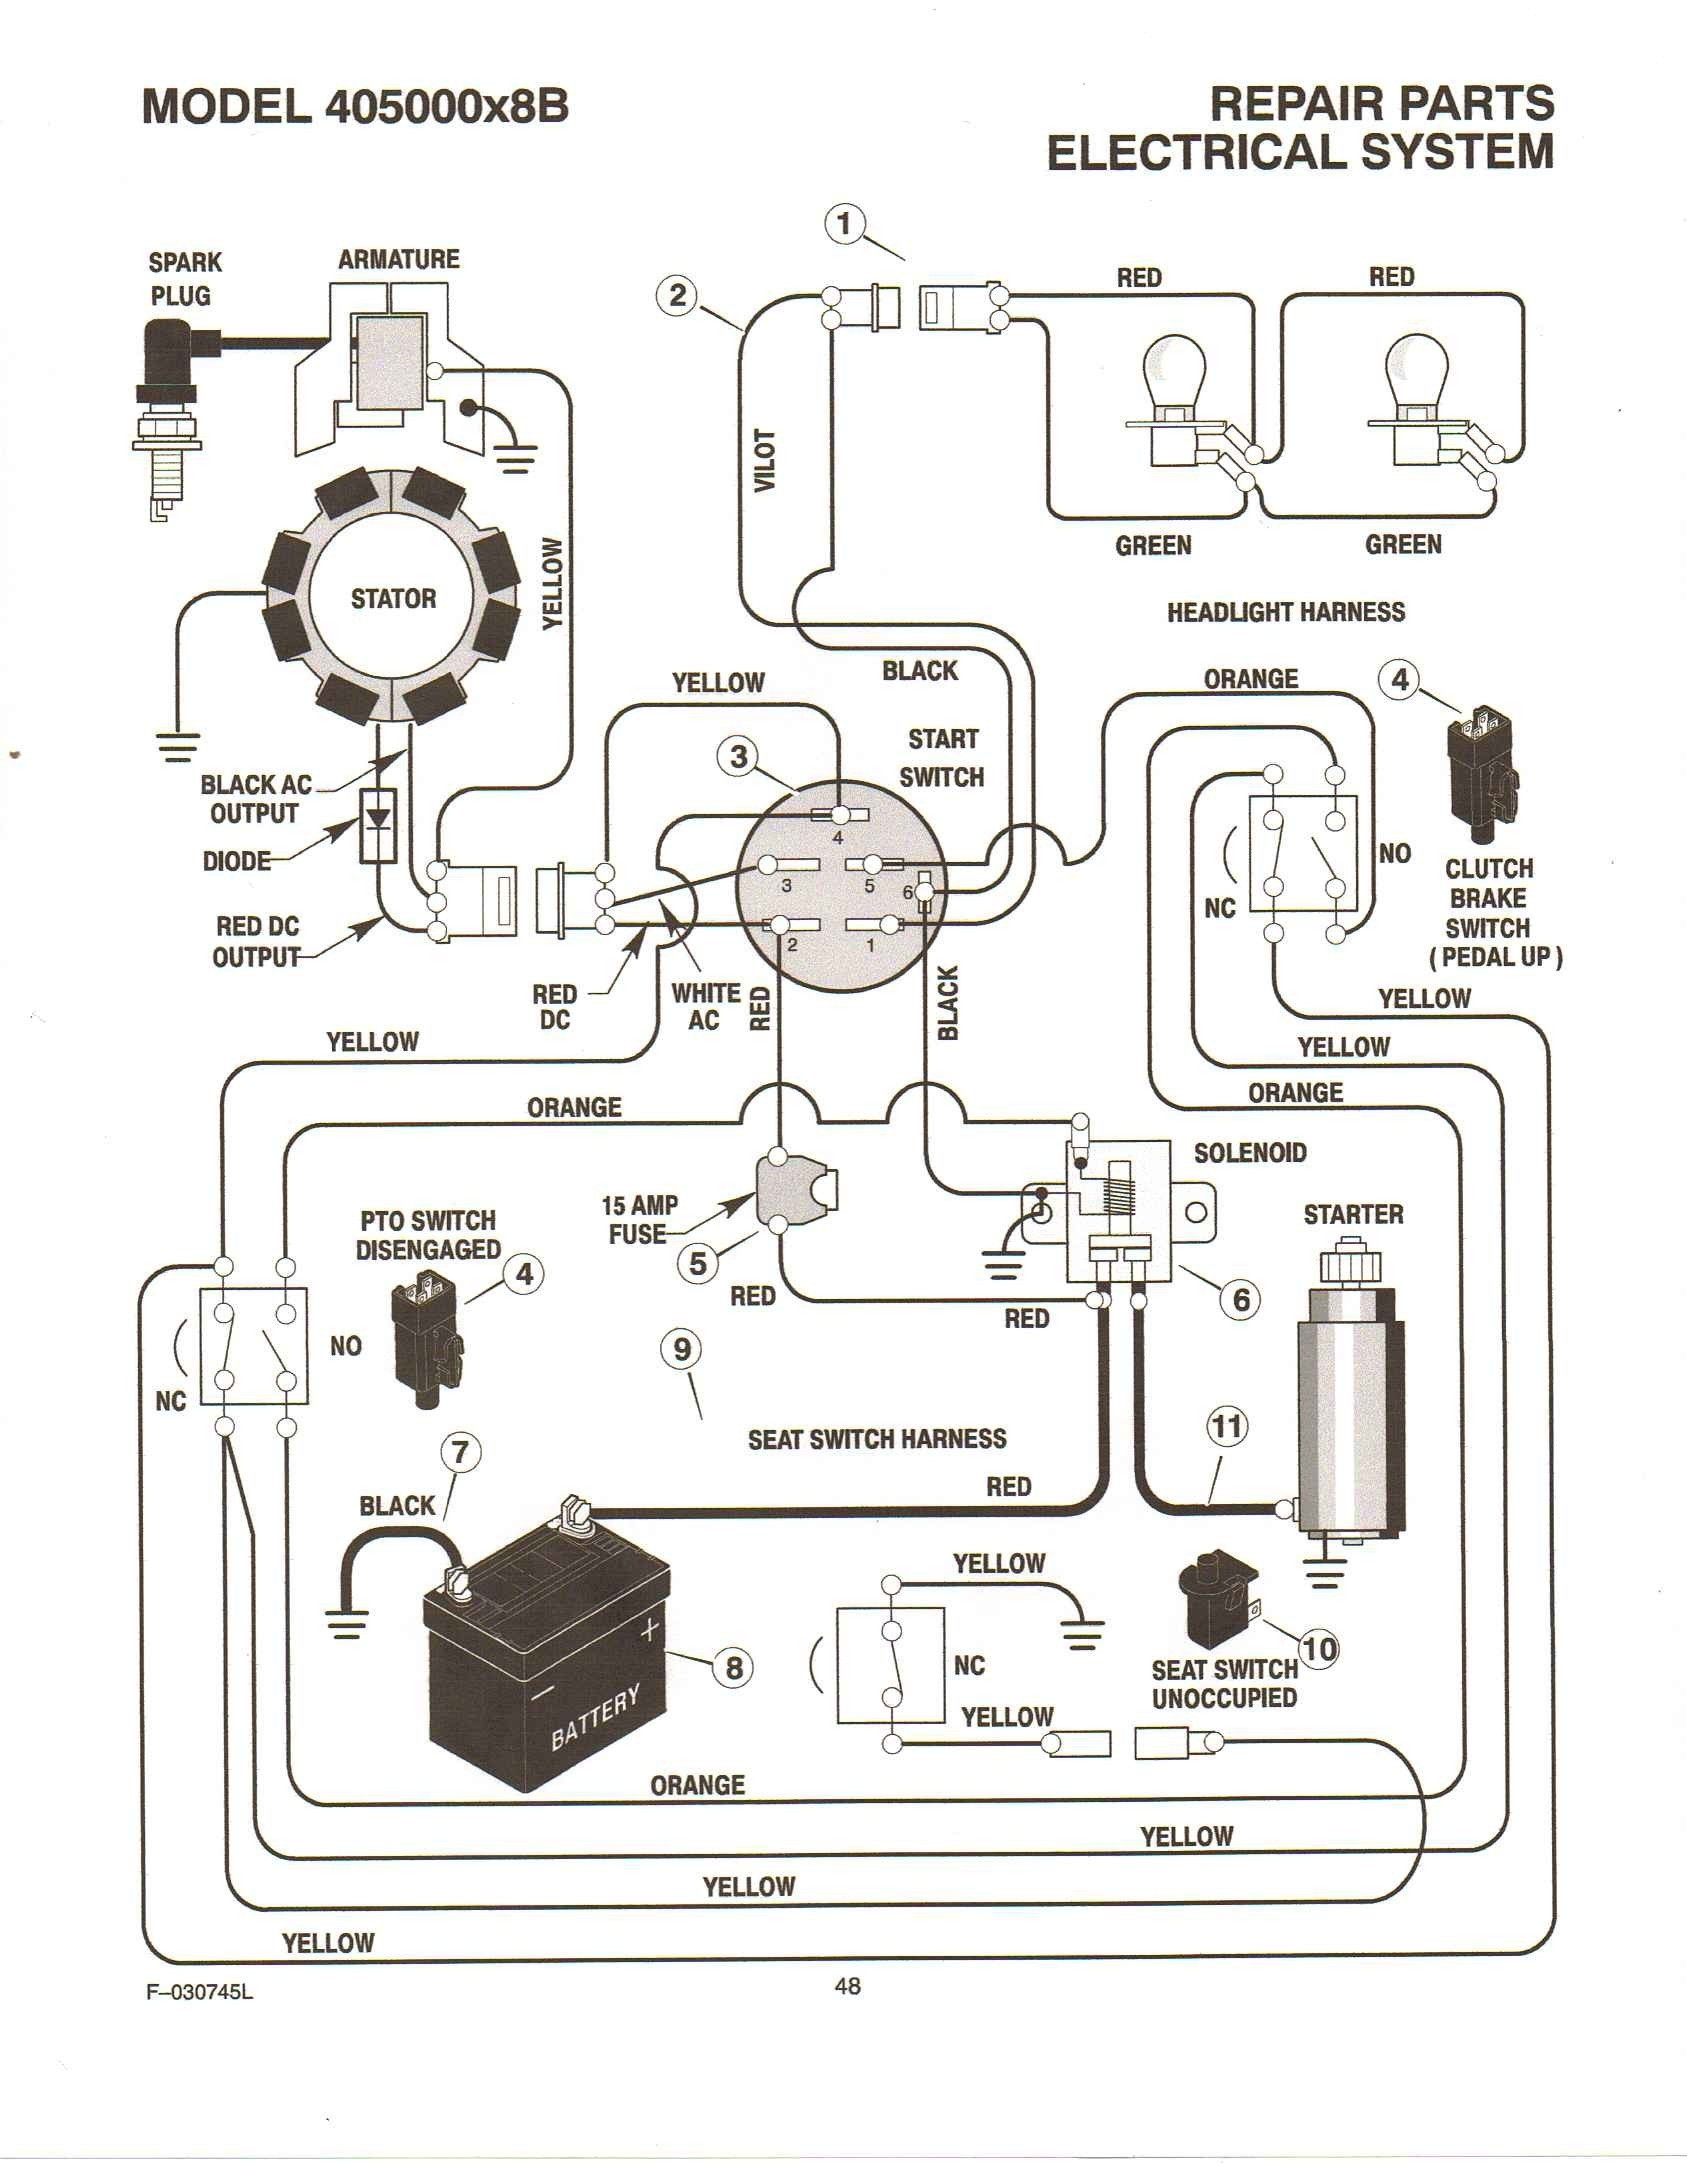 briggs and stratton 6 5 hp engine diagram